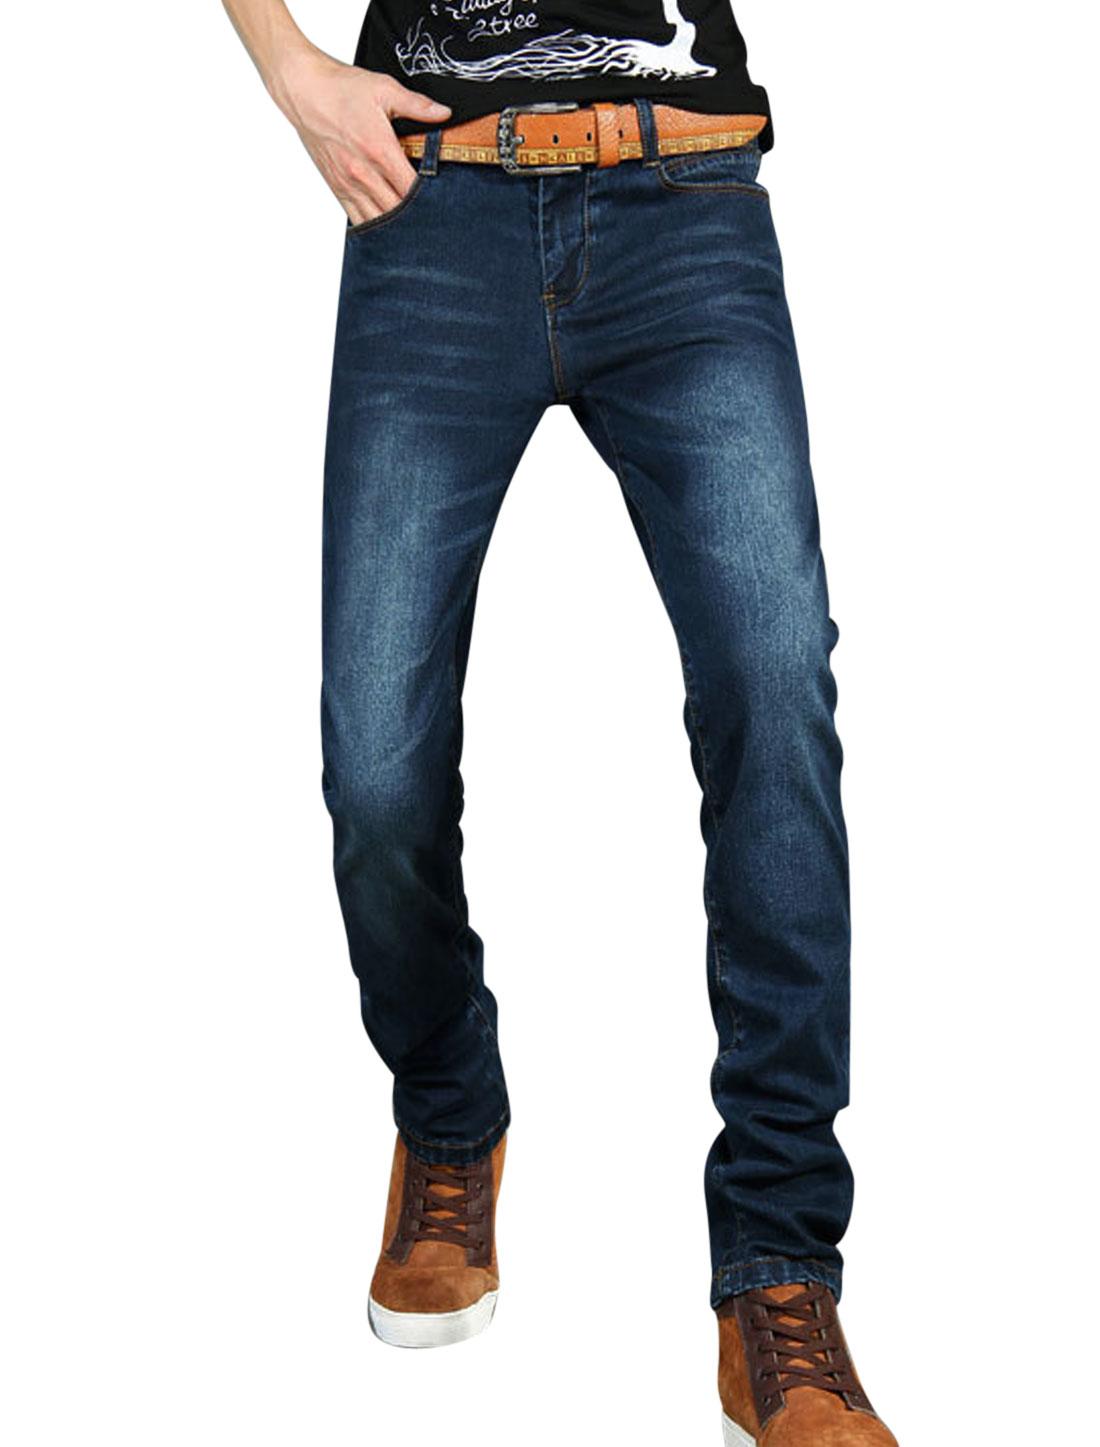 Men Dark Blue Zip Closed Two Pockets Back Side Pockets Casual Jeans W36